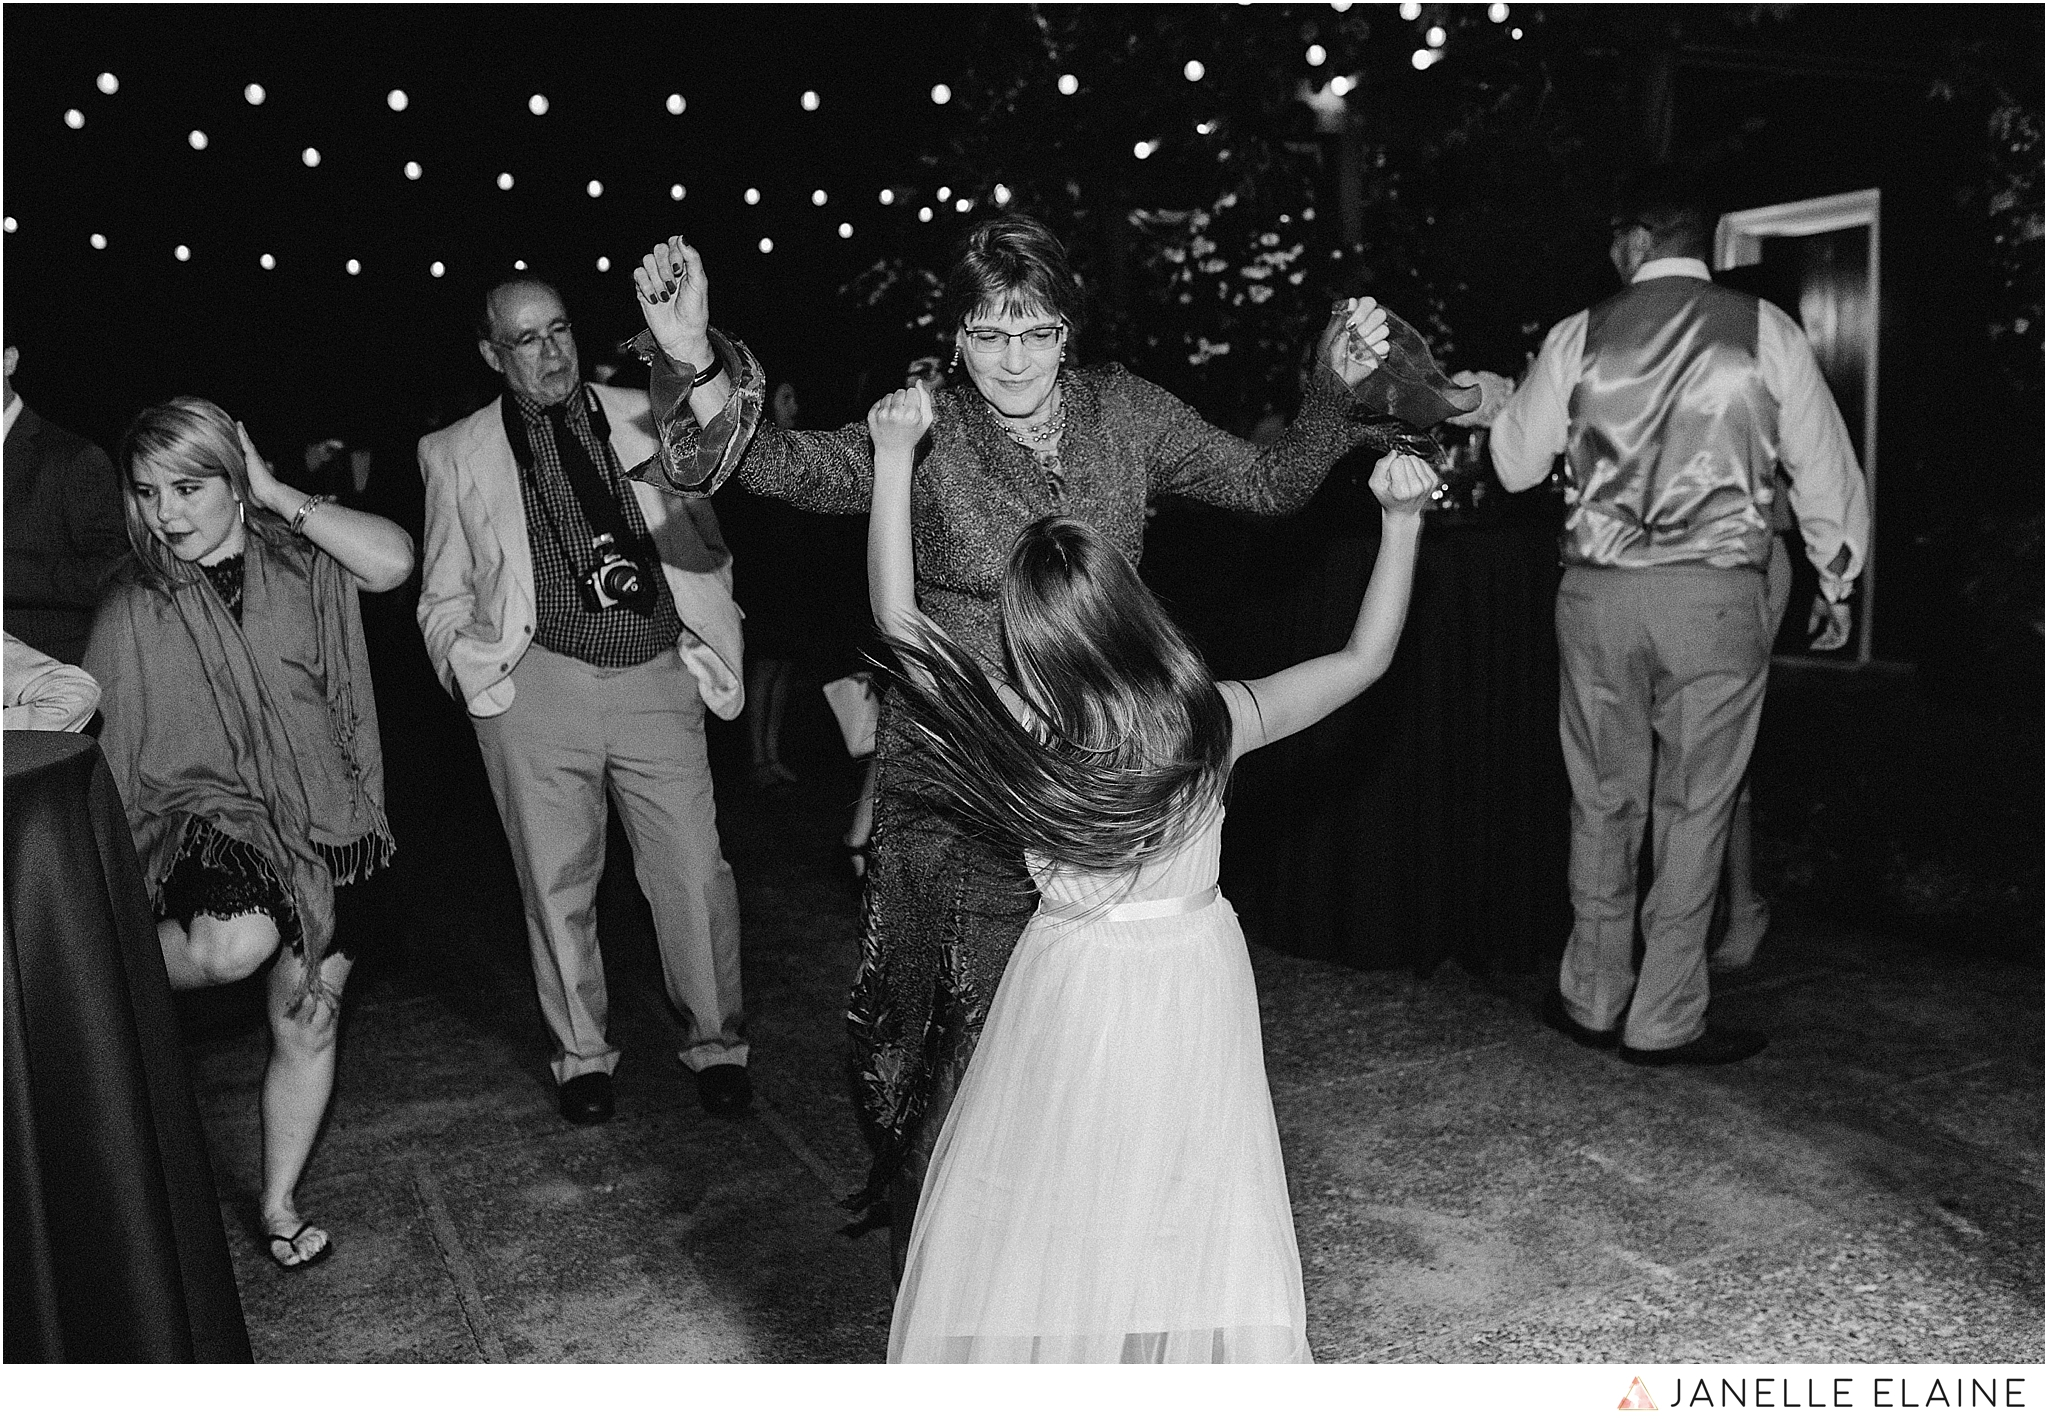 janelle elaine photography-professional wedding photographer-seattle-bellevue-robinswood house-287.jpg